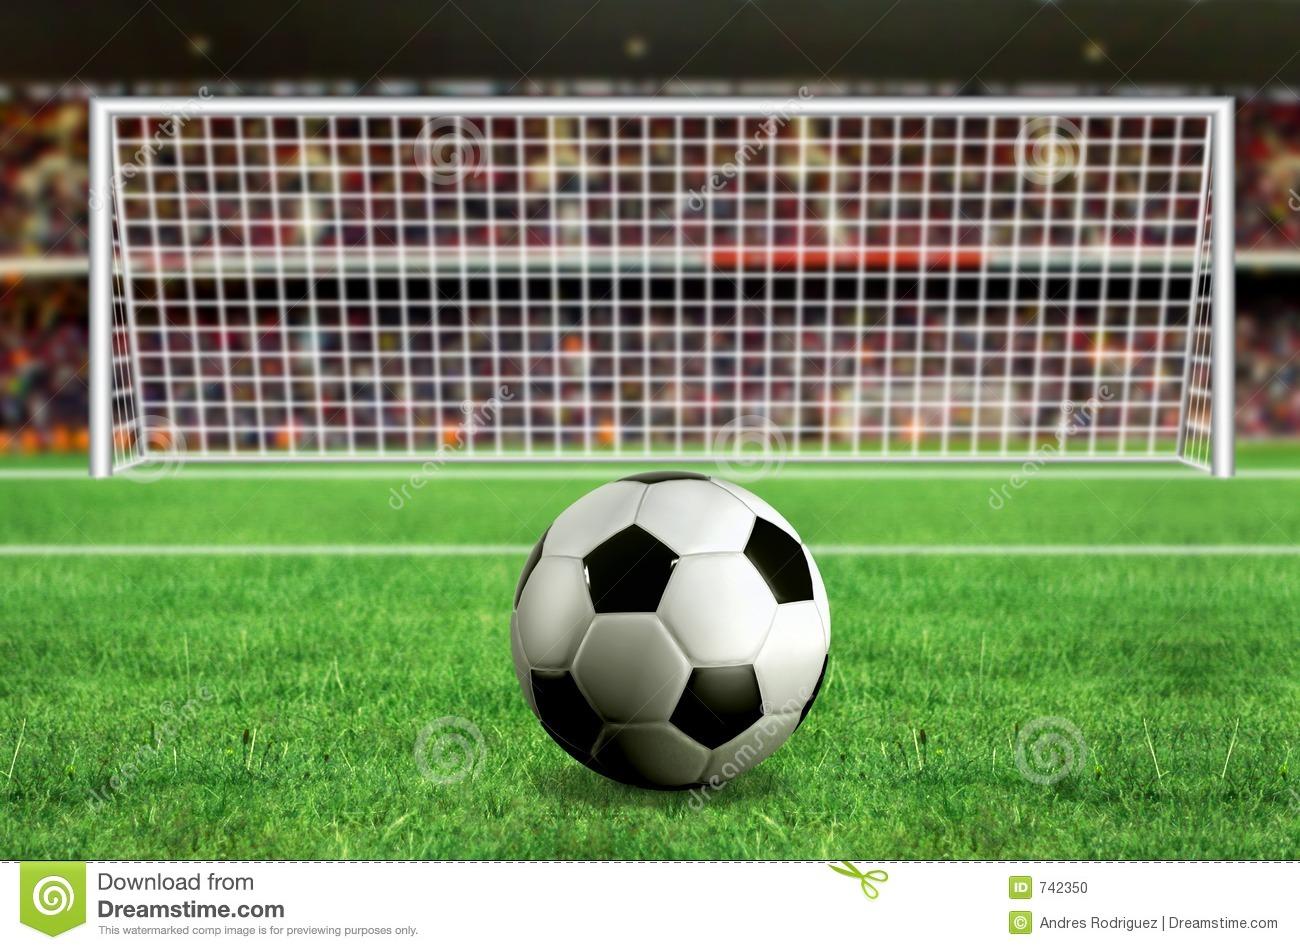 Opgeven penaltybokaal 2021